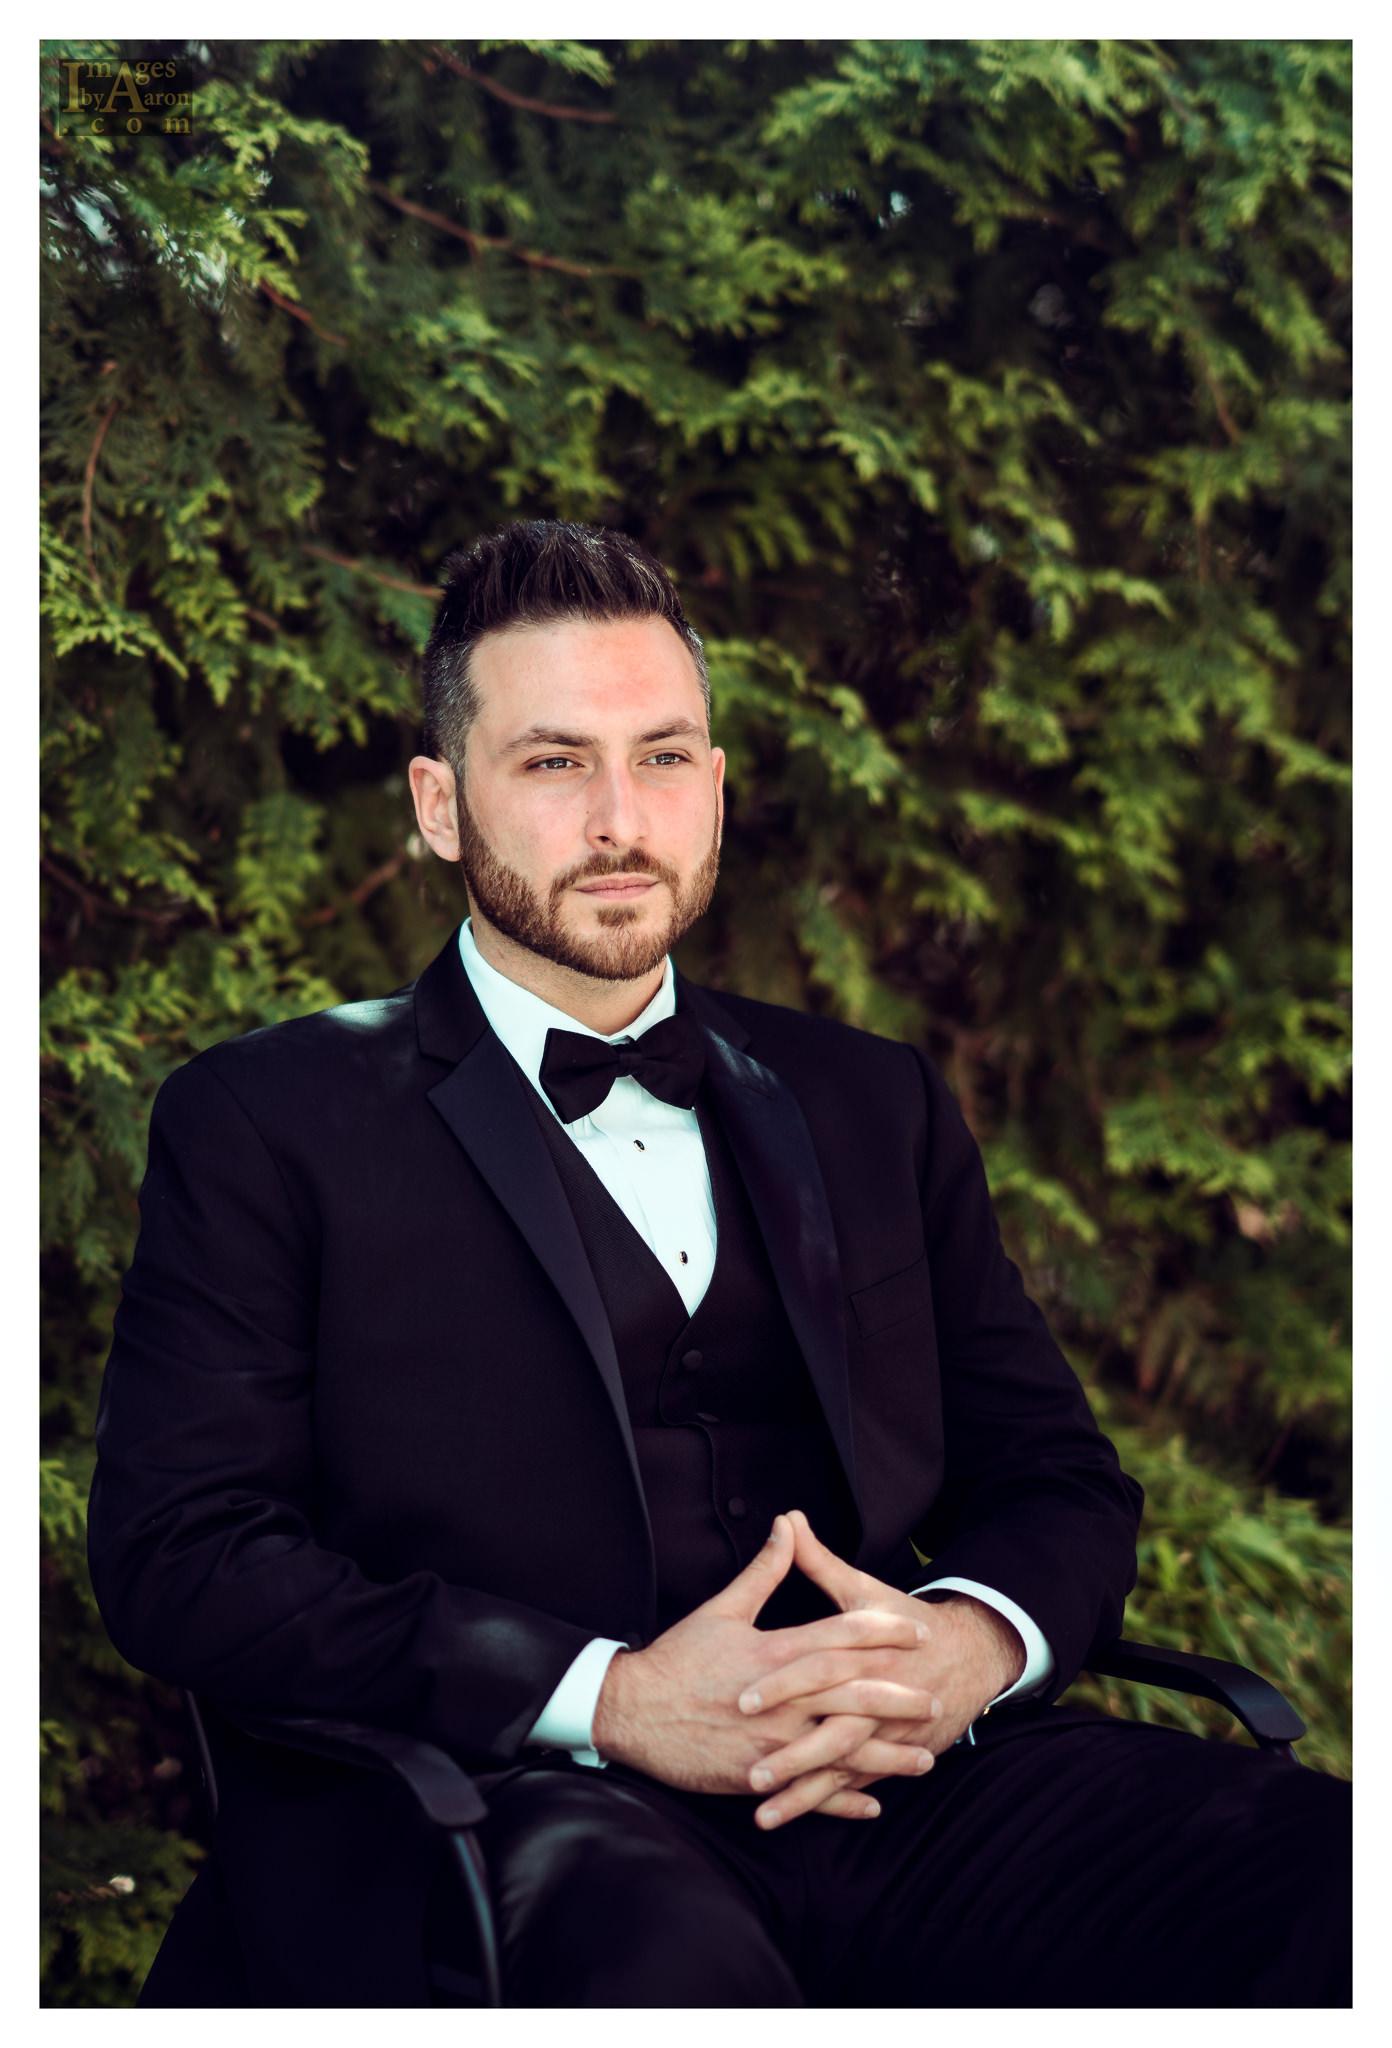 Gokce Turkish Wedding Gtting Ready New York Photographer Wedding Photography The Royal Manor-1.jpg